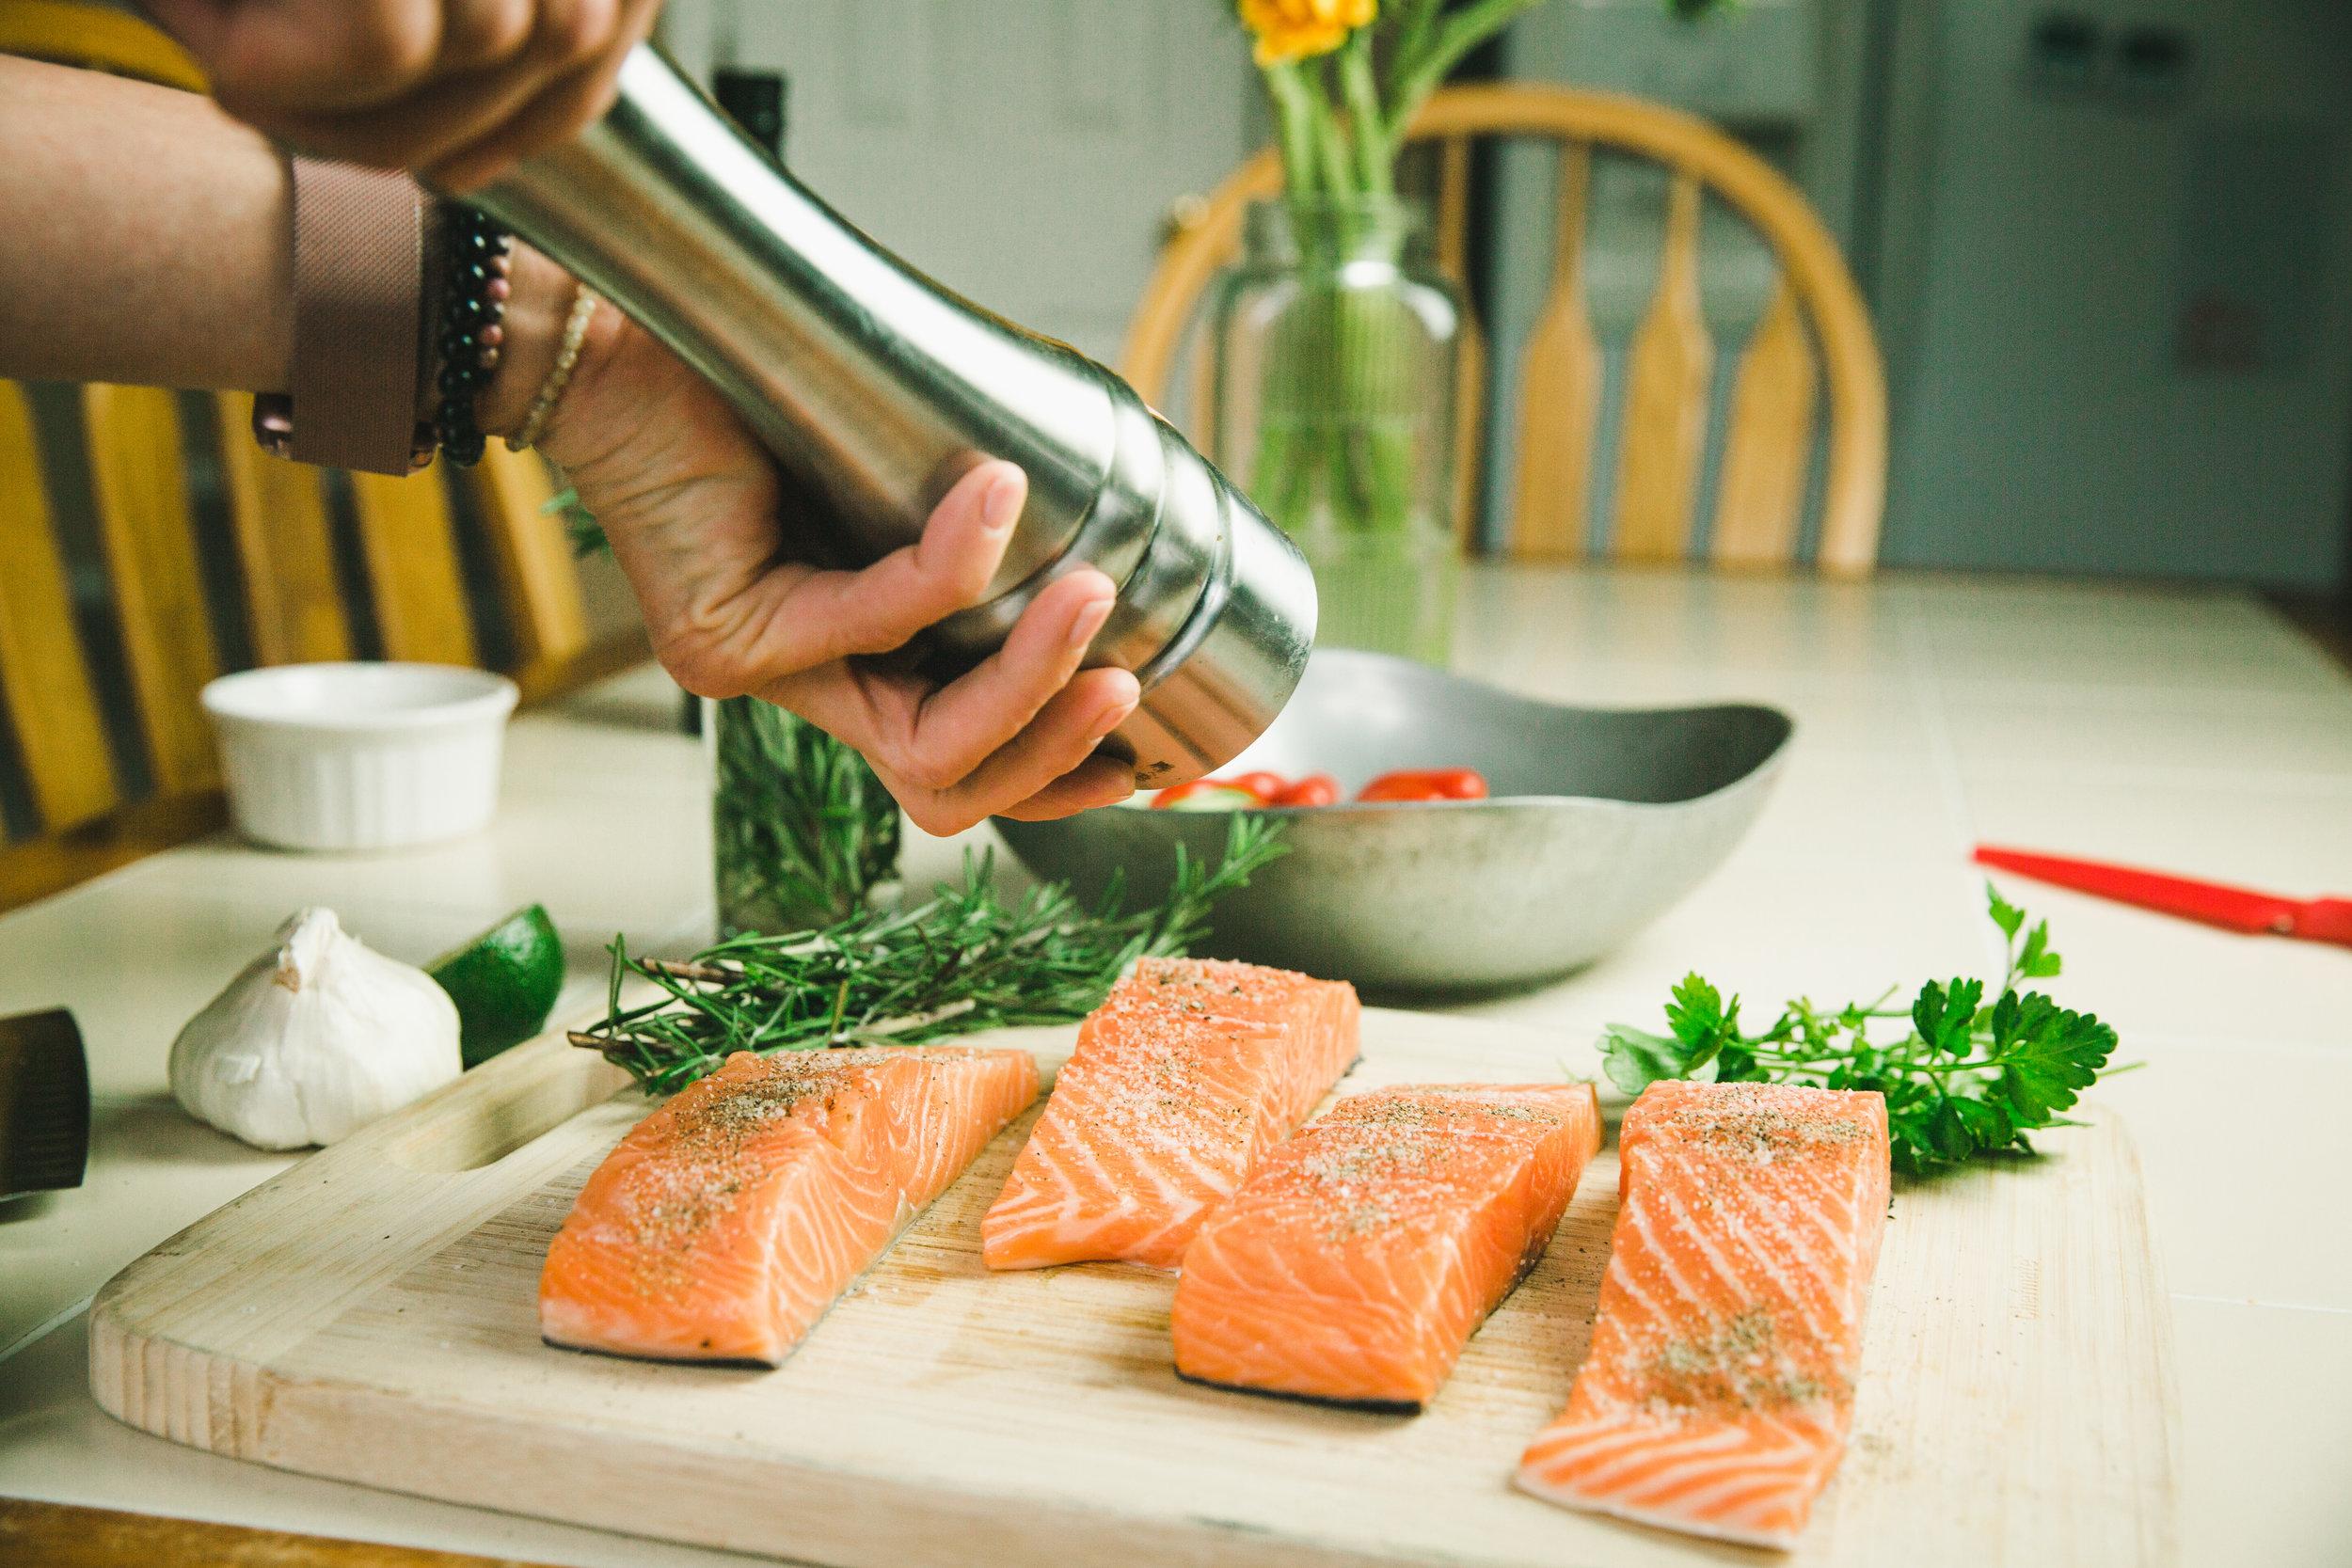 Step 2 - Sprinkle each salmon generously with kosher salt, garlic granules and ground pepper.